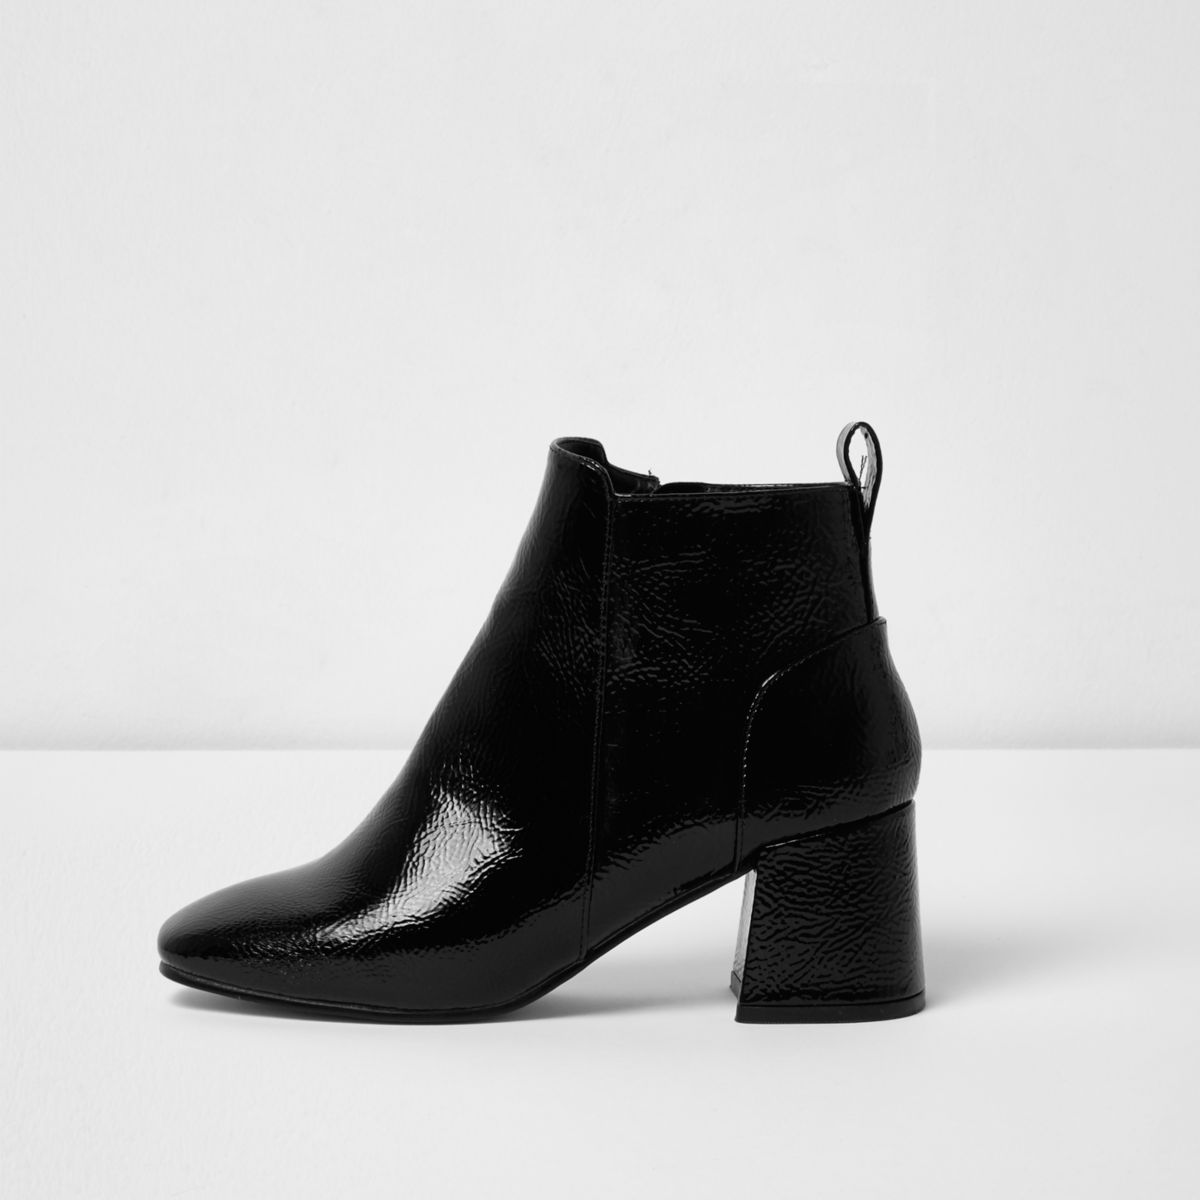 Black patent square toe block heel boots